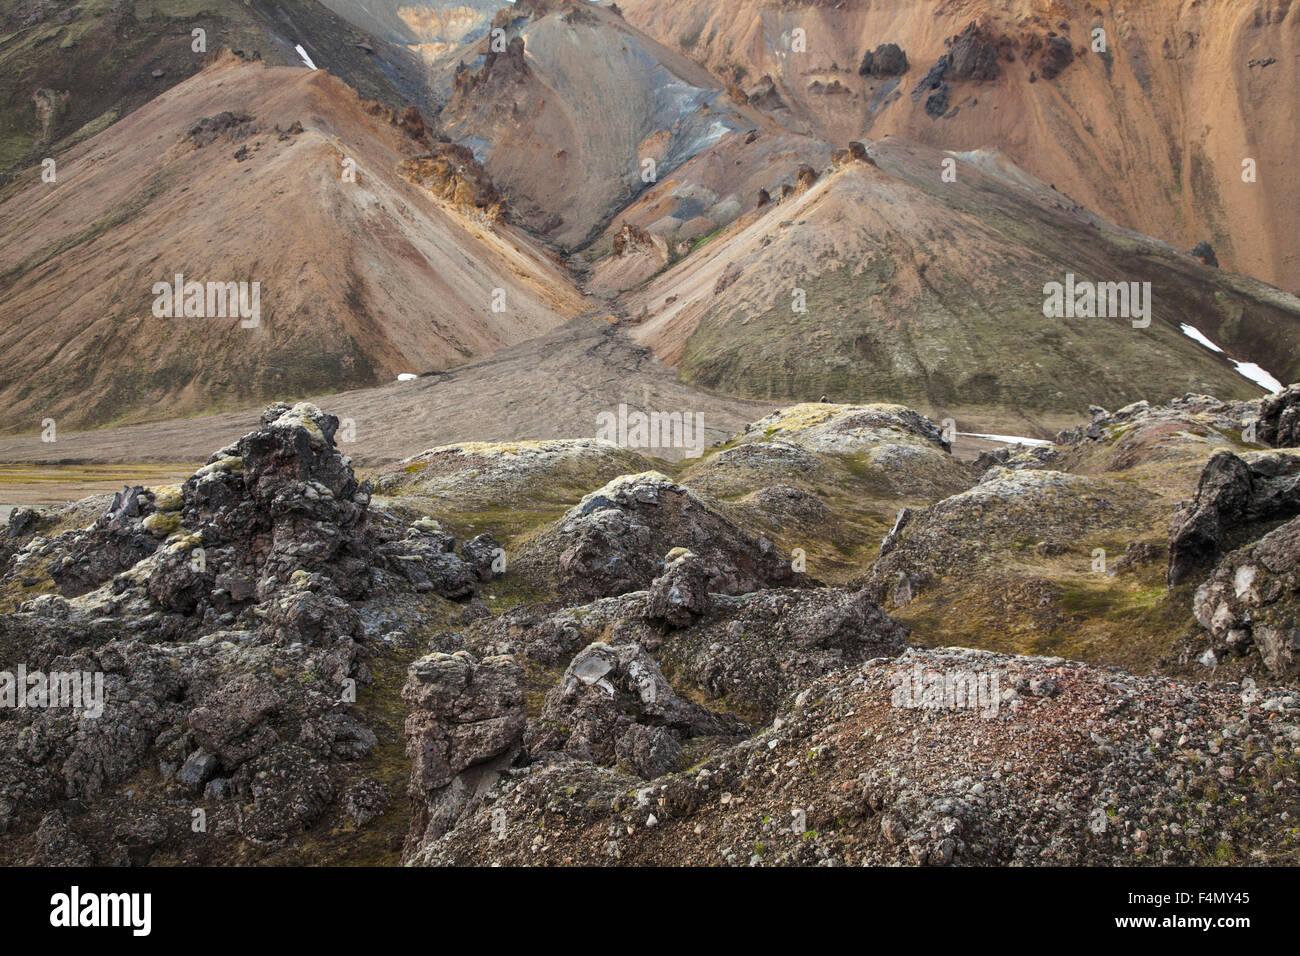 Lava field beneath rhyolite mountains, Landmannalaugar, Sudhurland, Iceland. - Stock Image